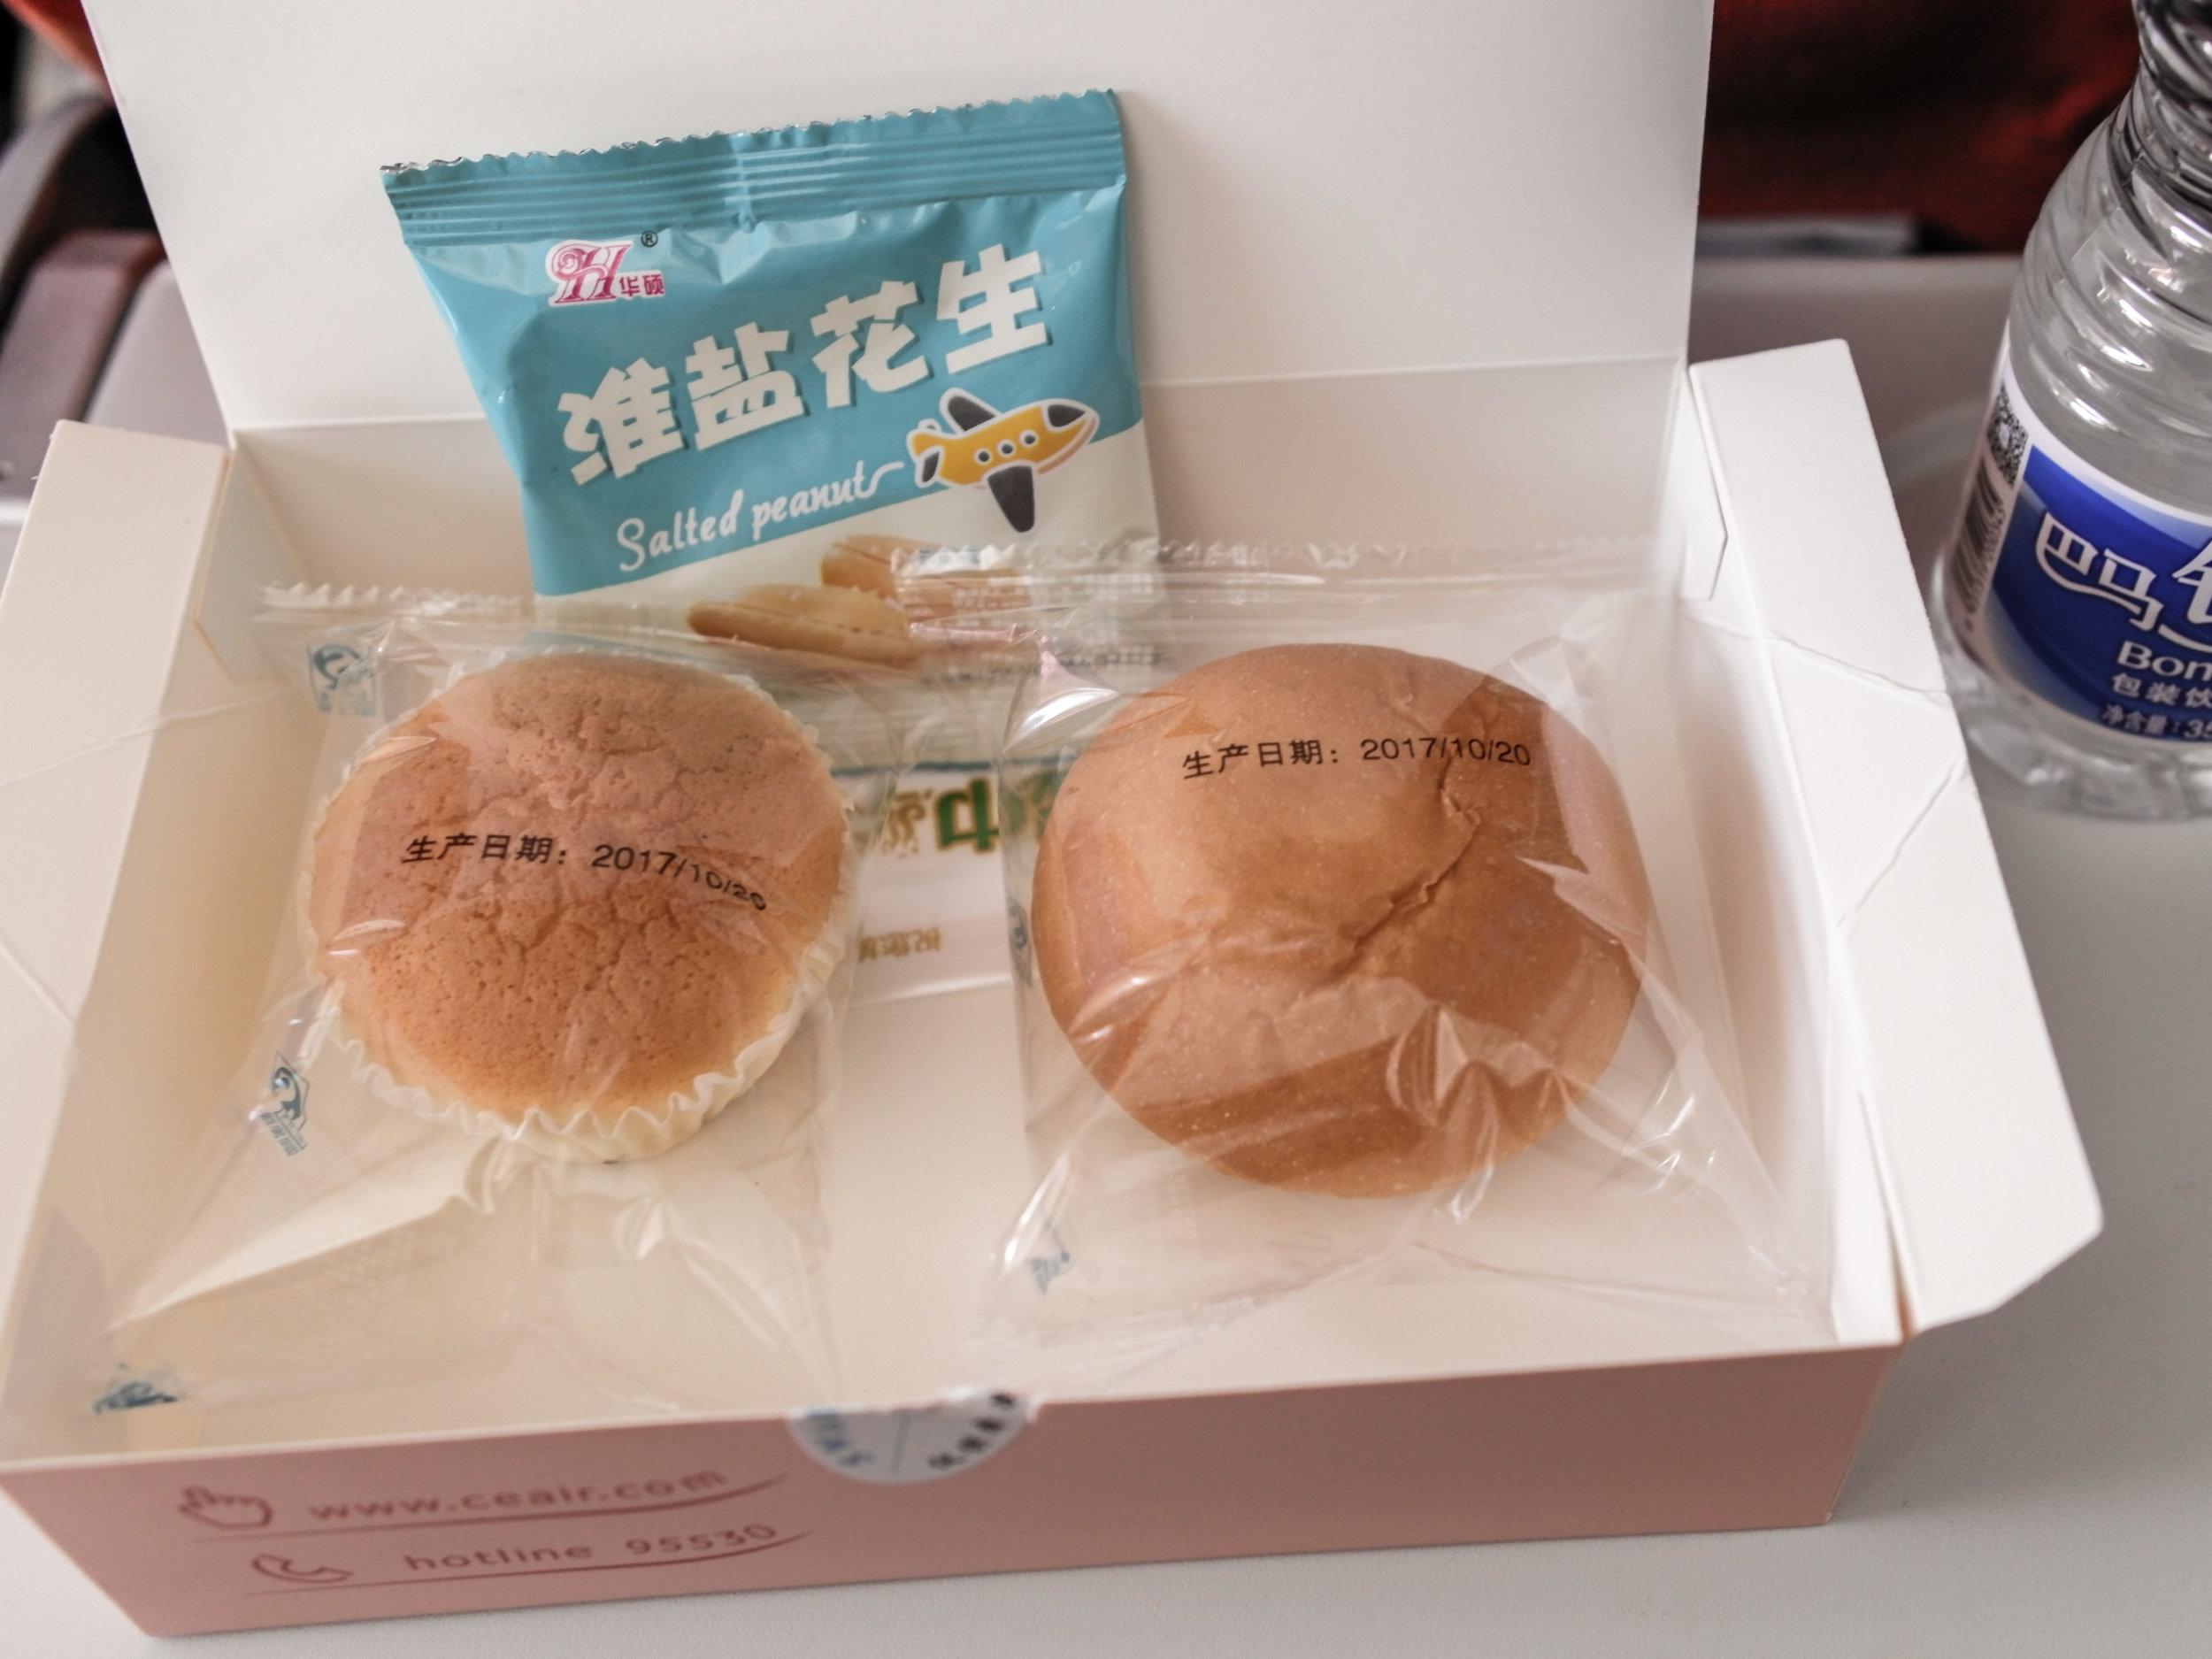 China Eastern Boeing 737 - snack box